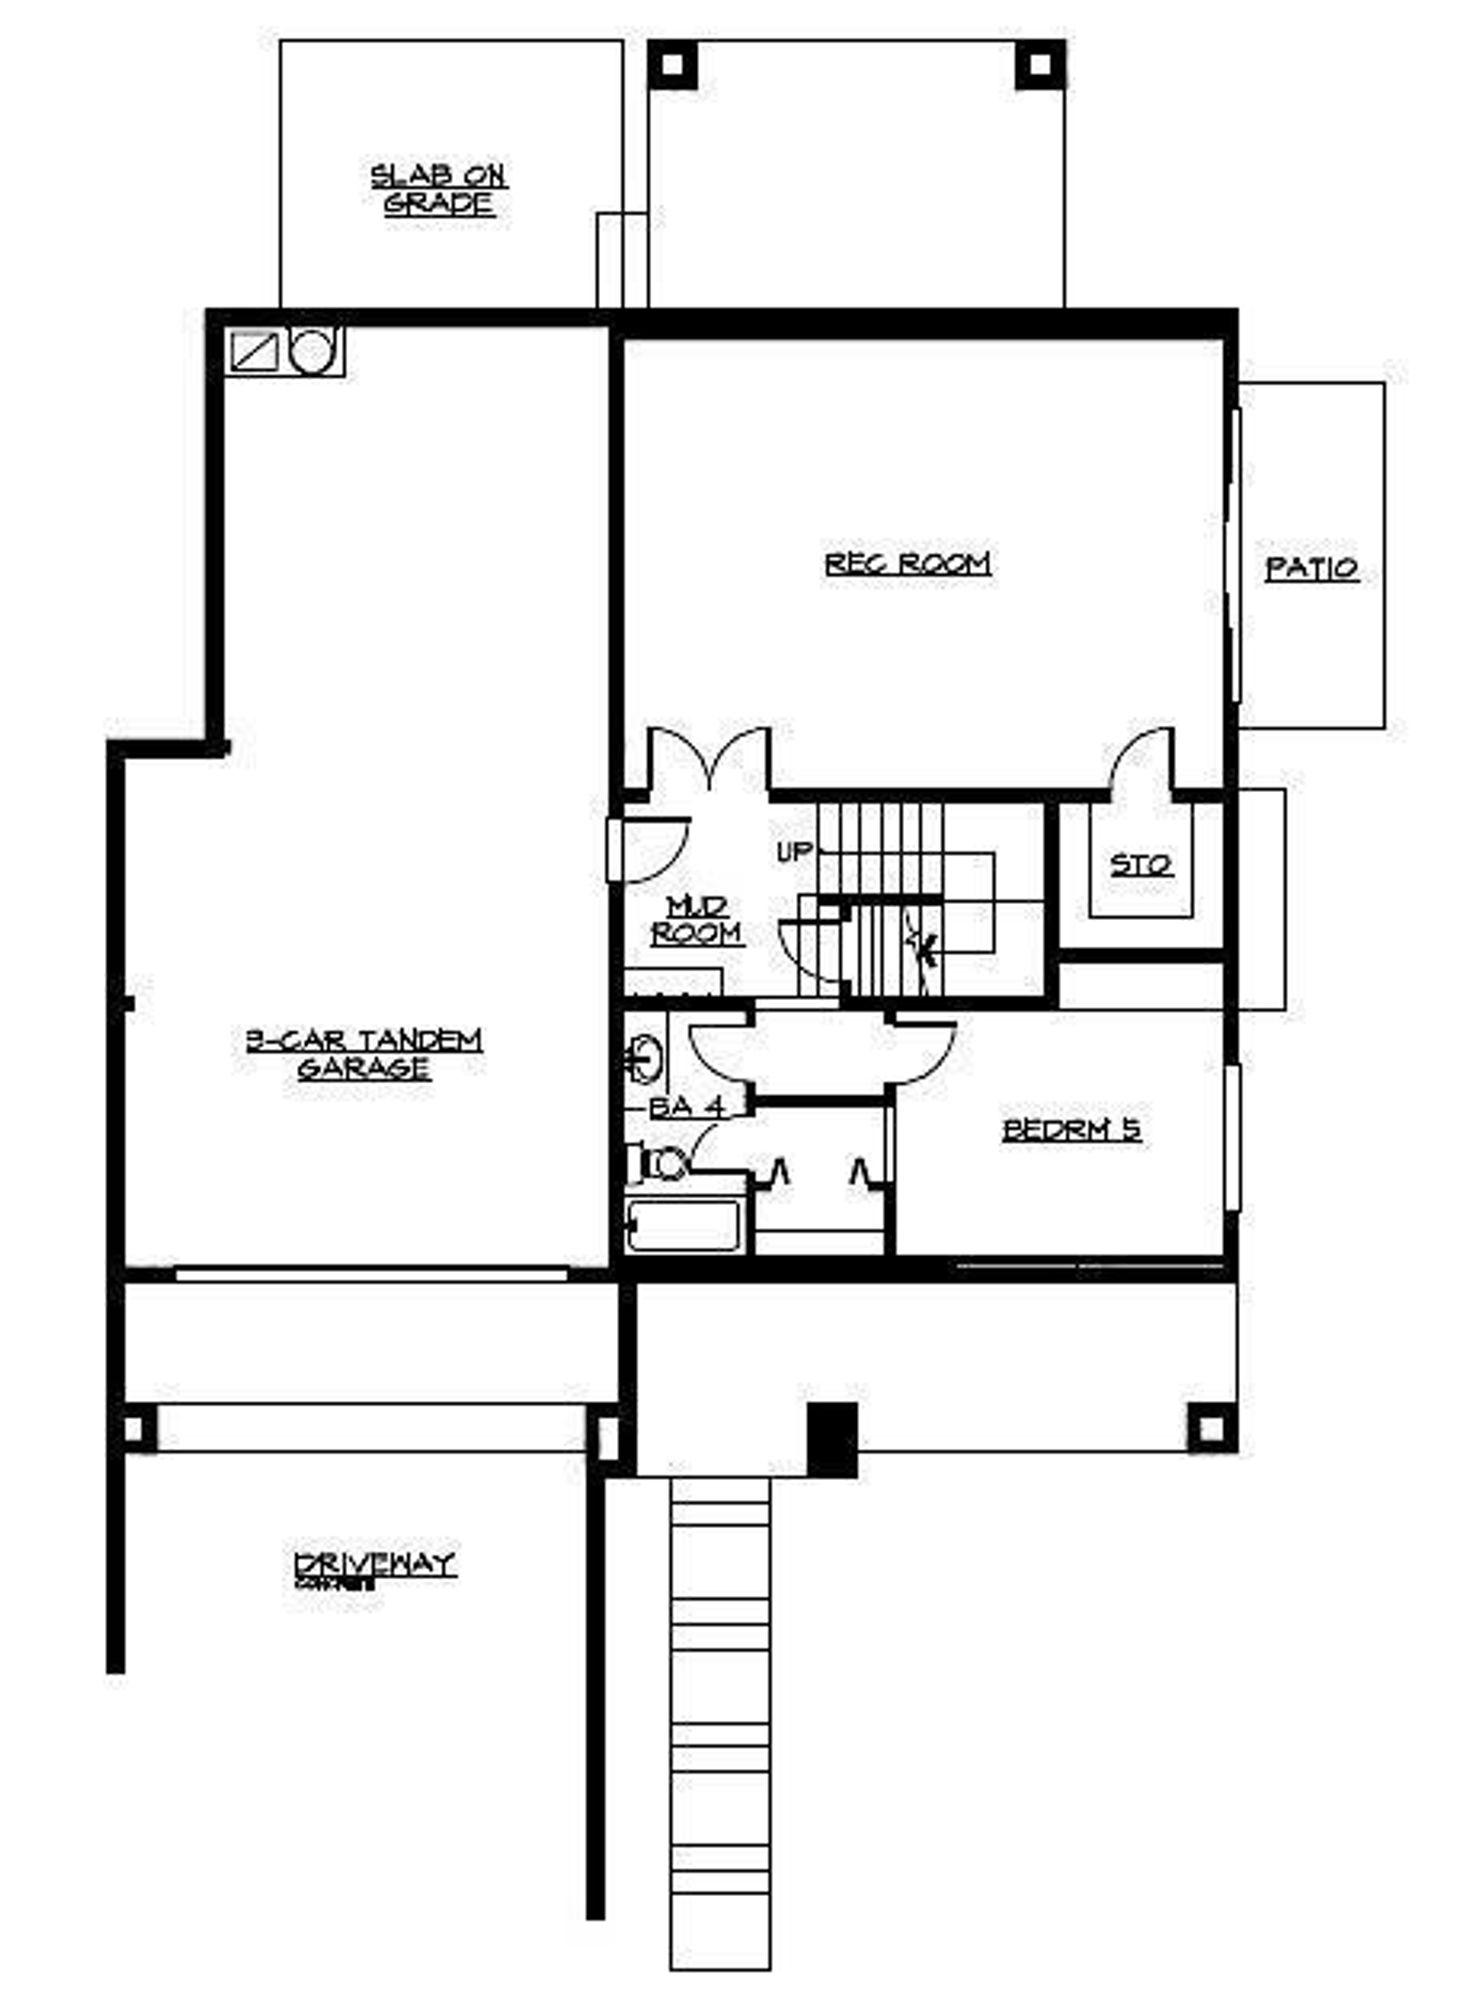 The Florence Avante Lower Floor Plan